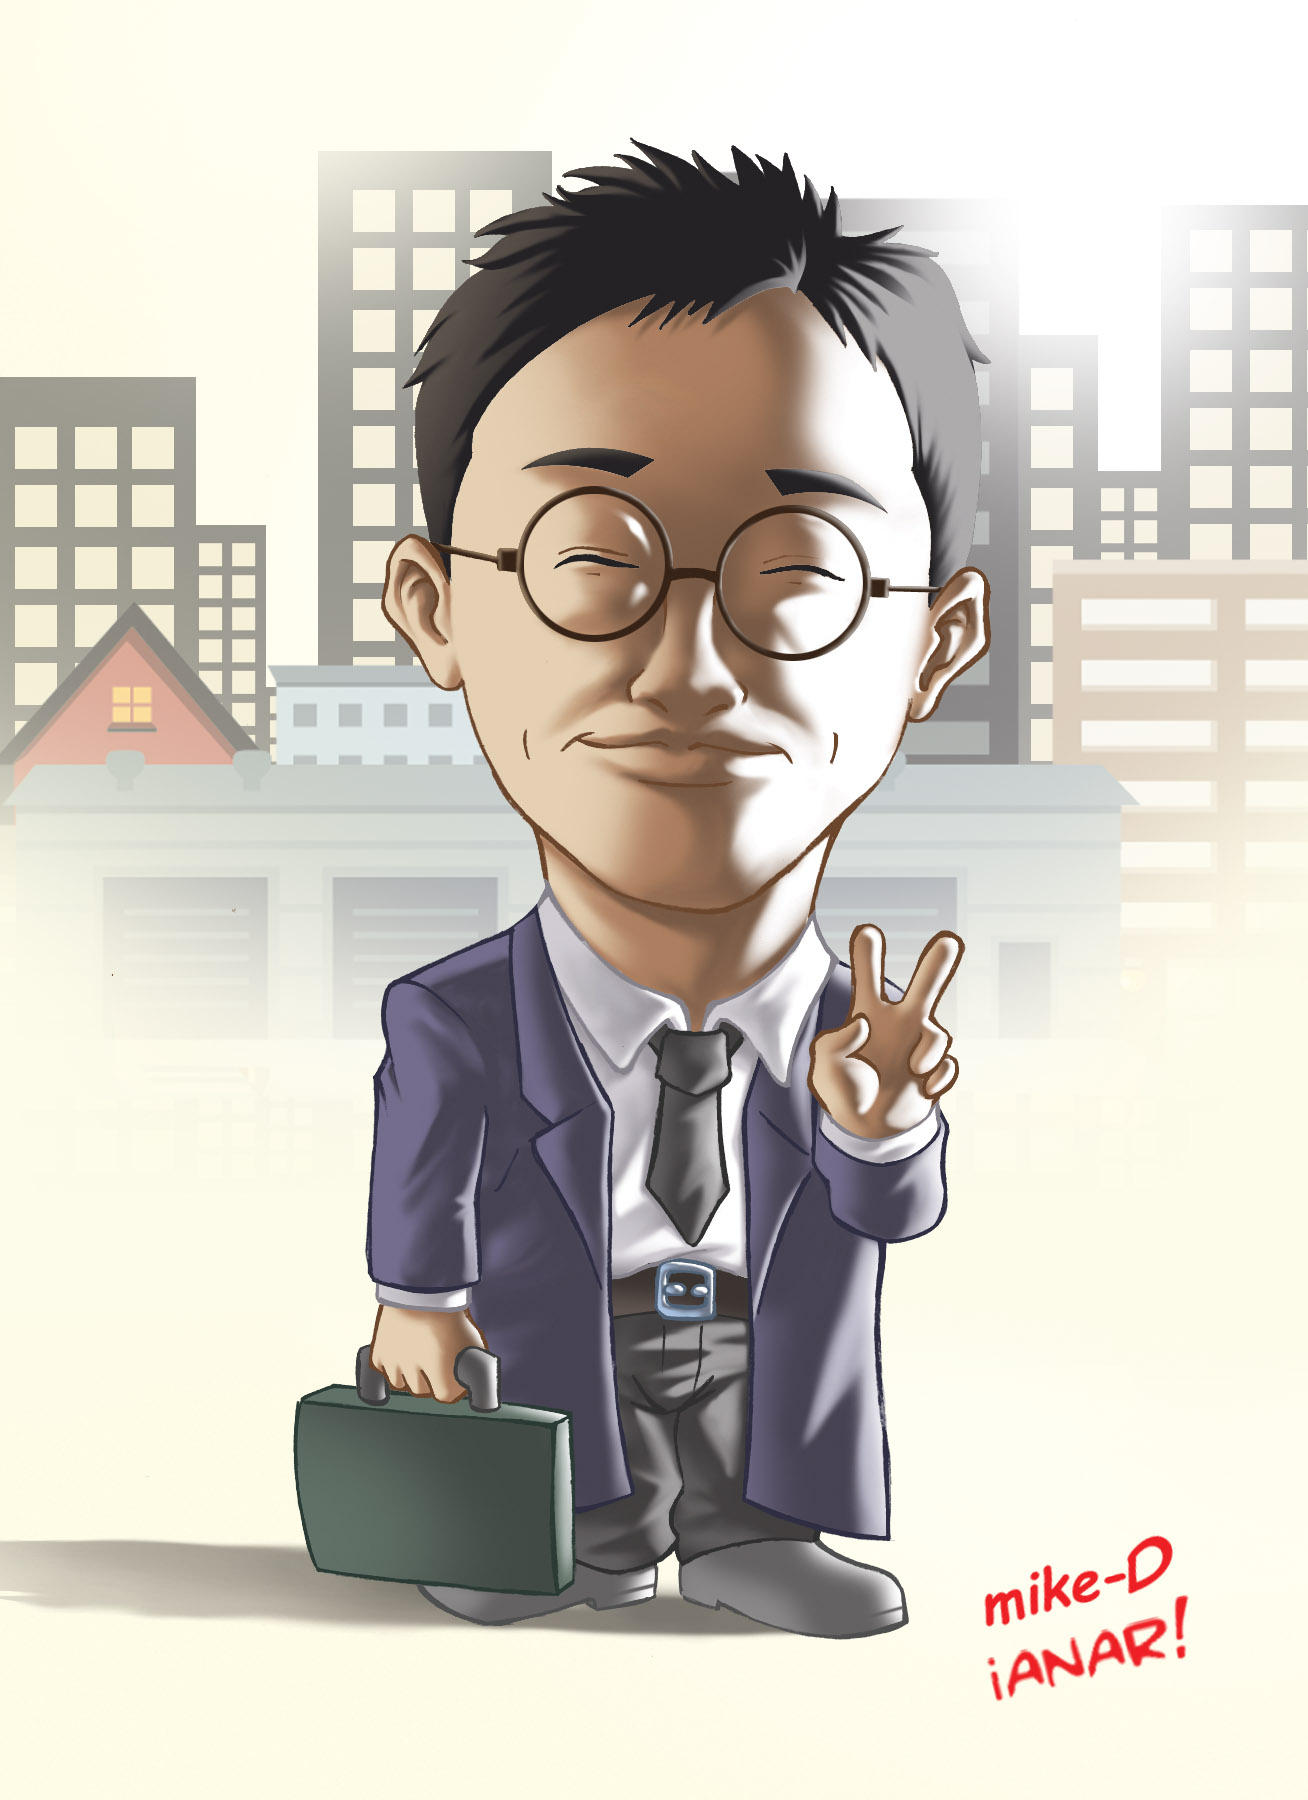 Joshua caricature by iANAR